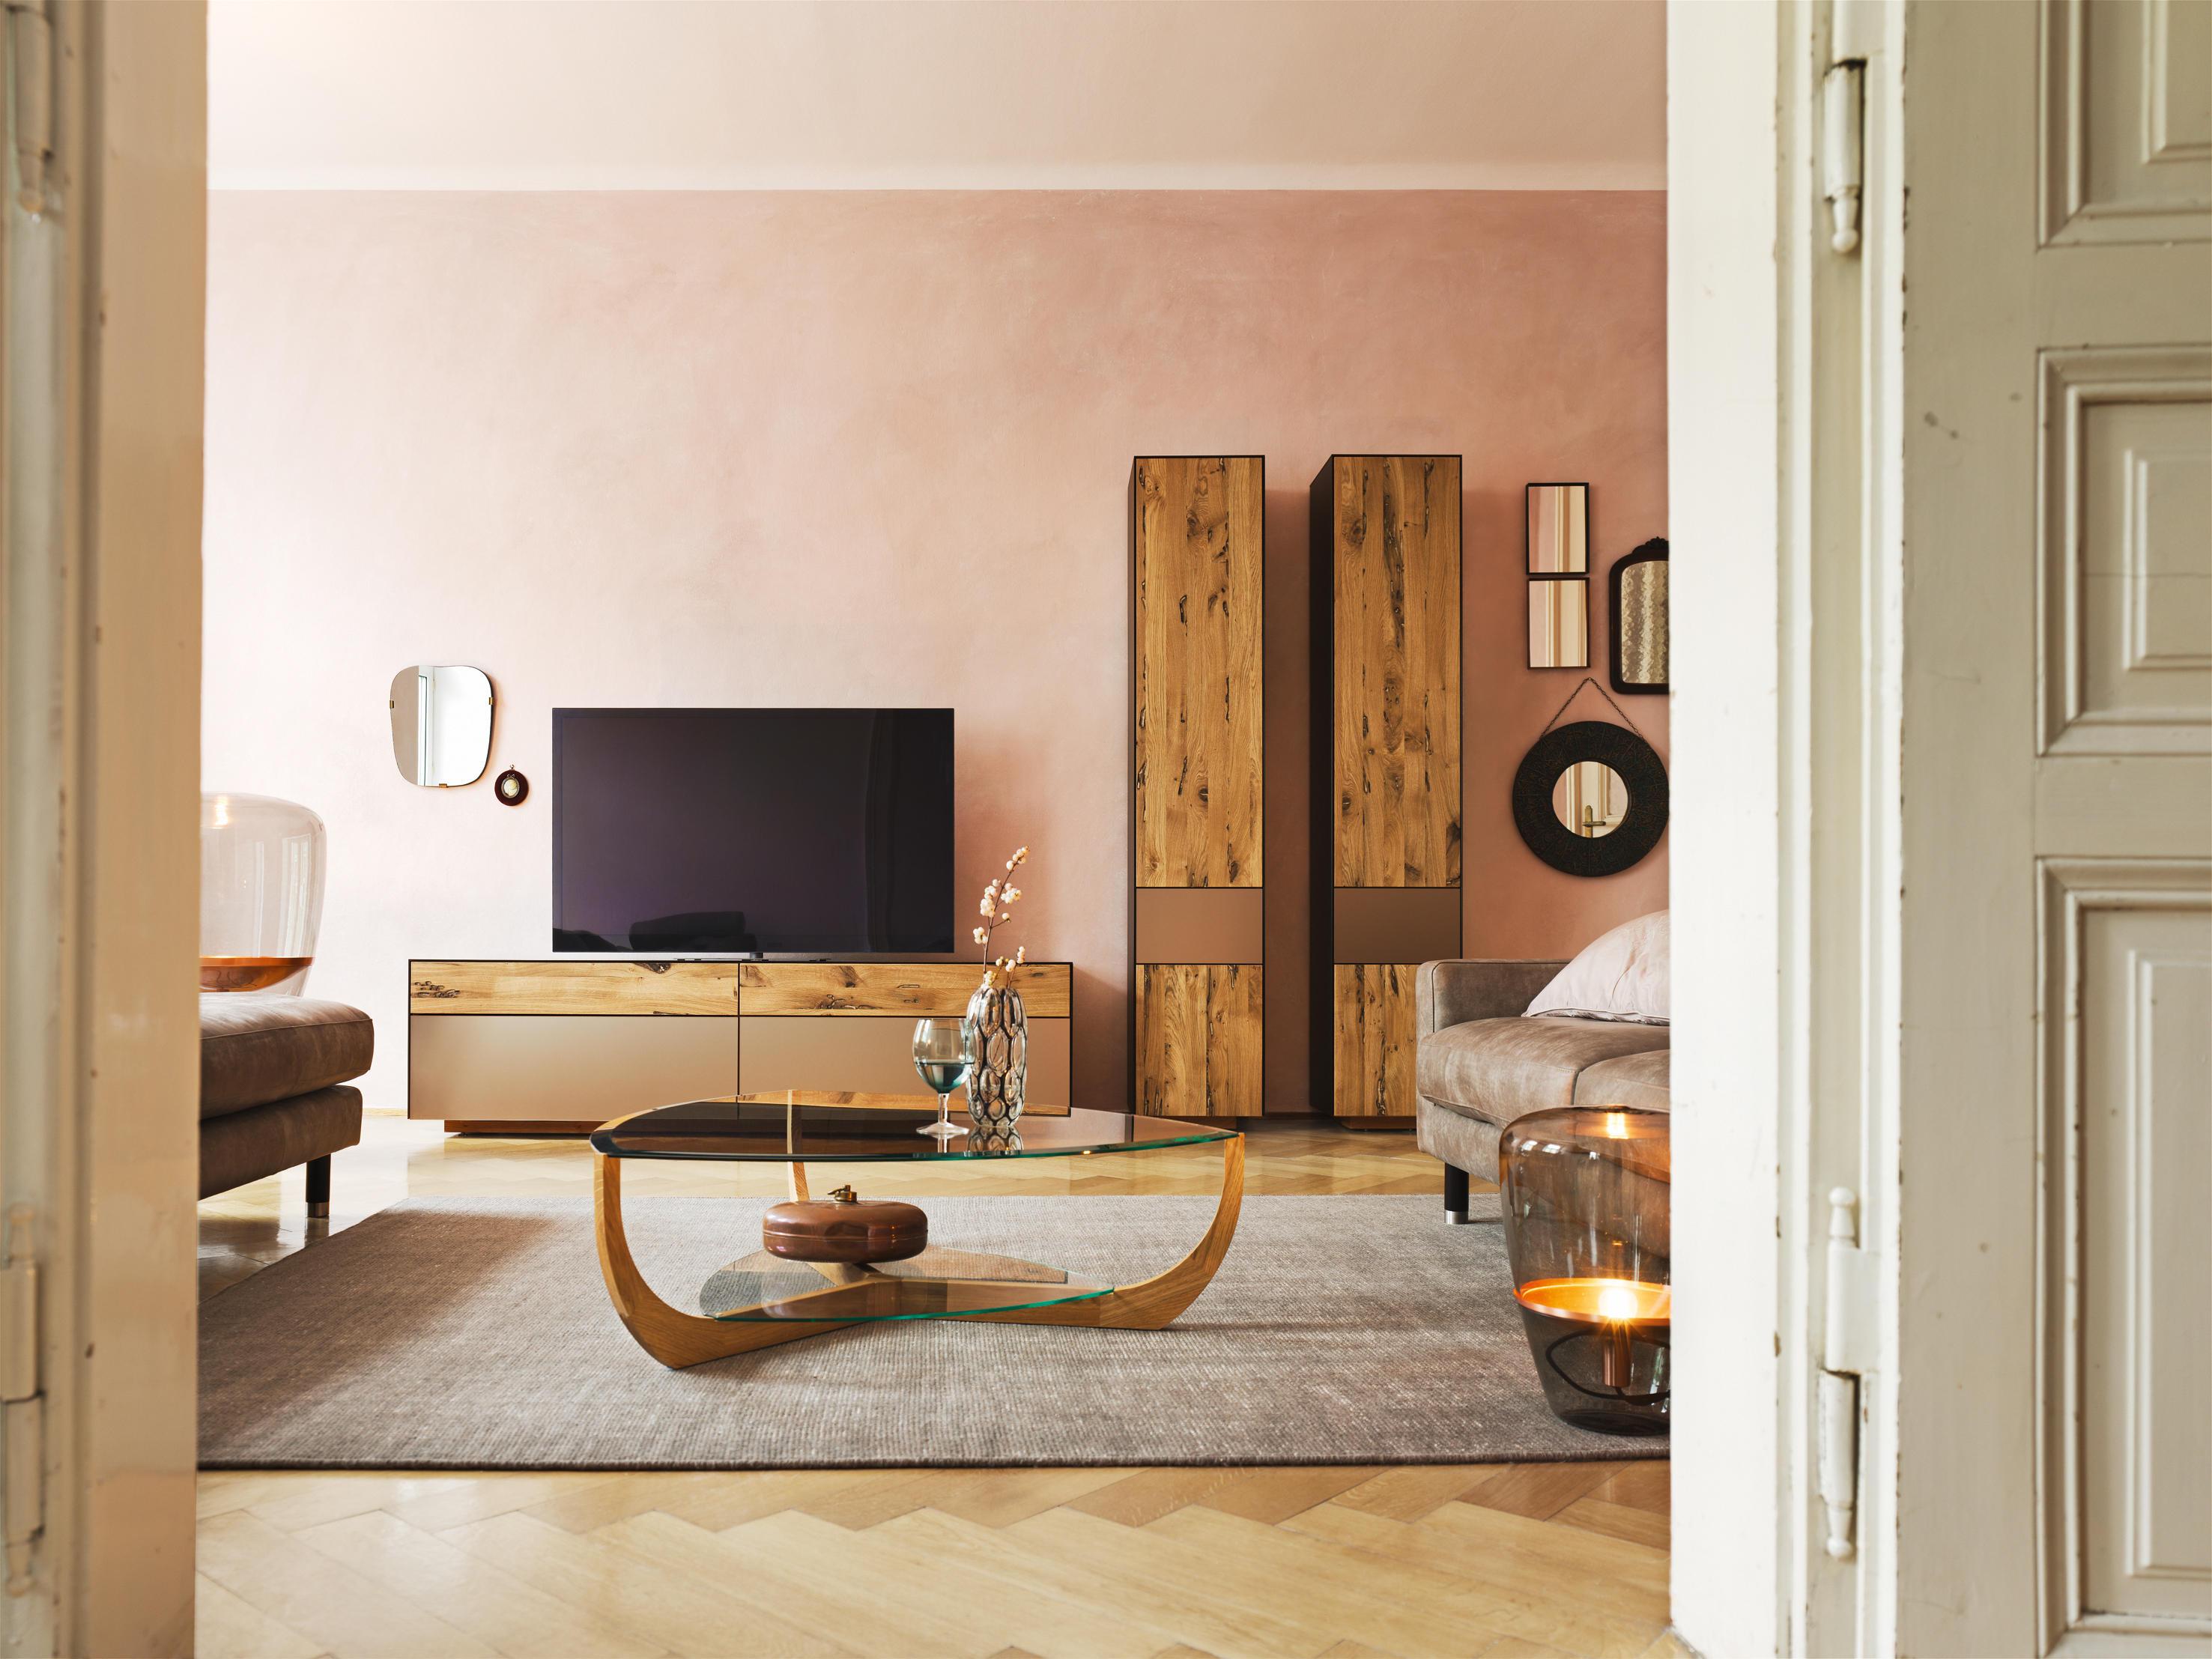 beautiful team 7 schlafzimmer gallery - house design ideas